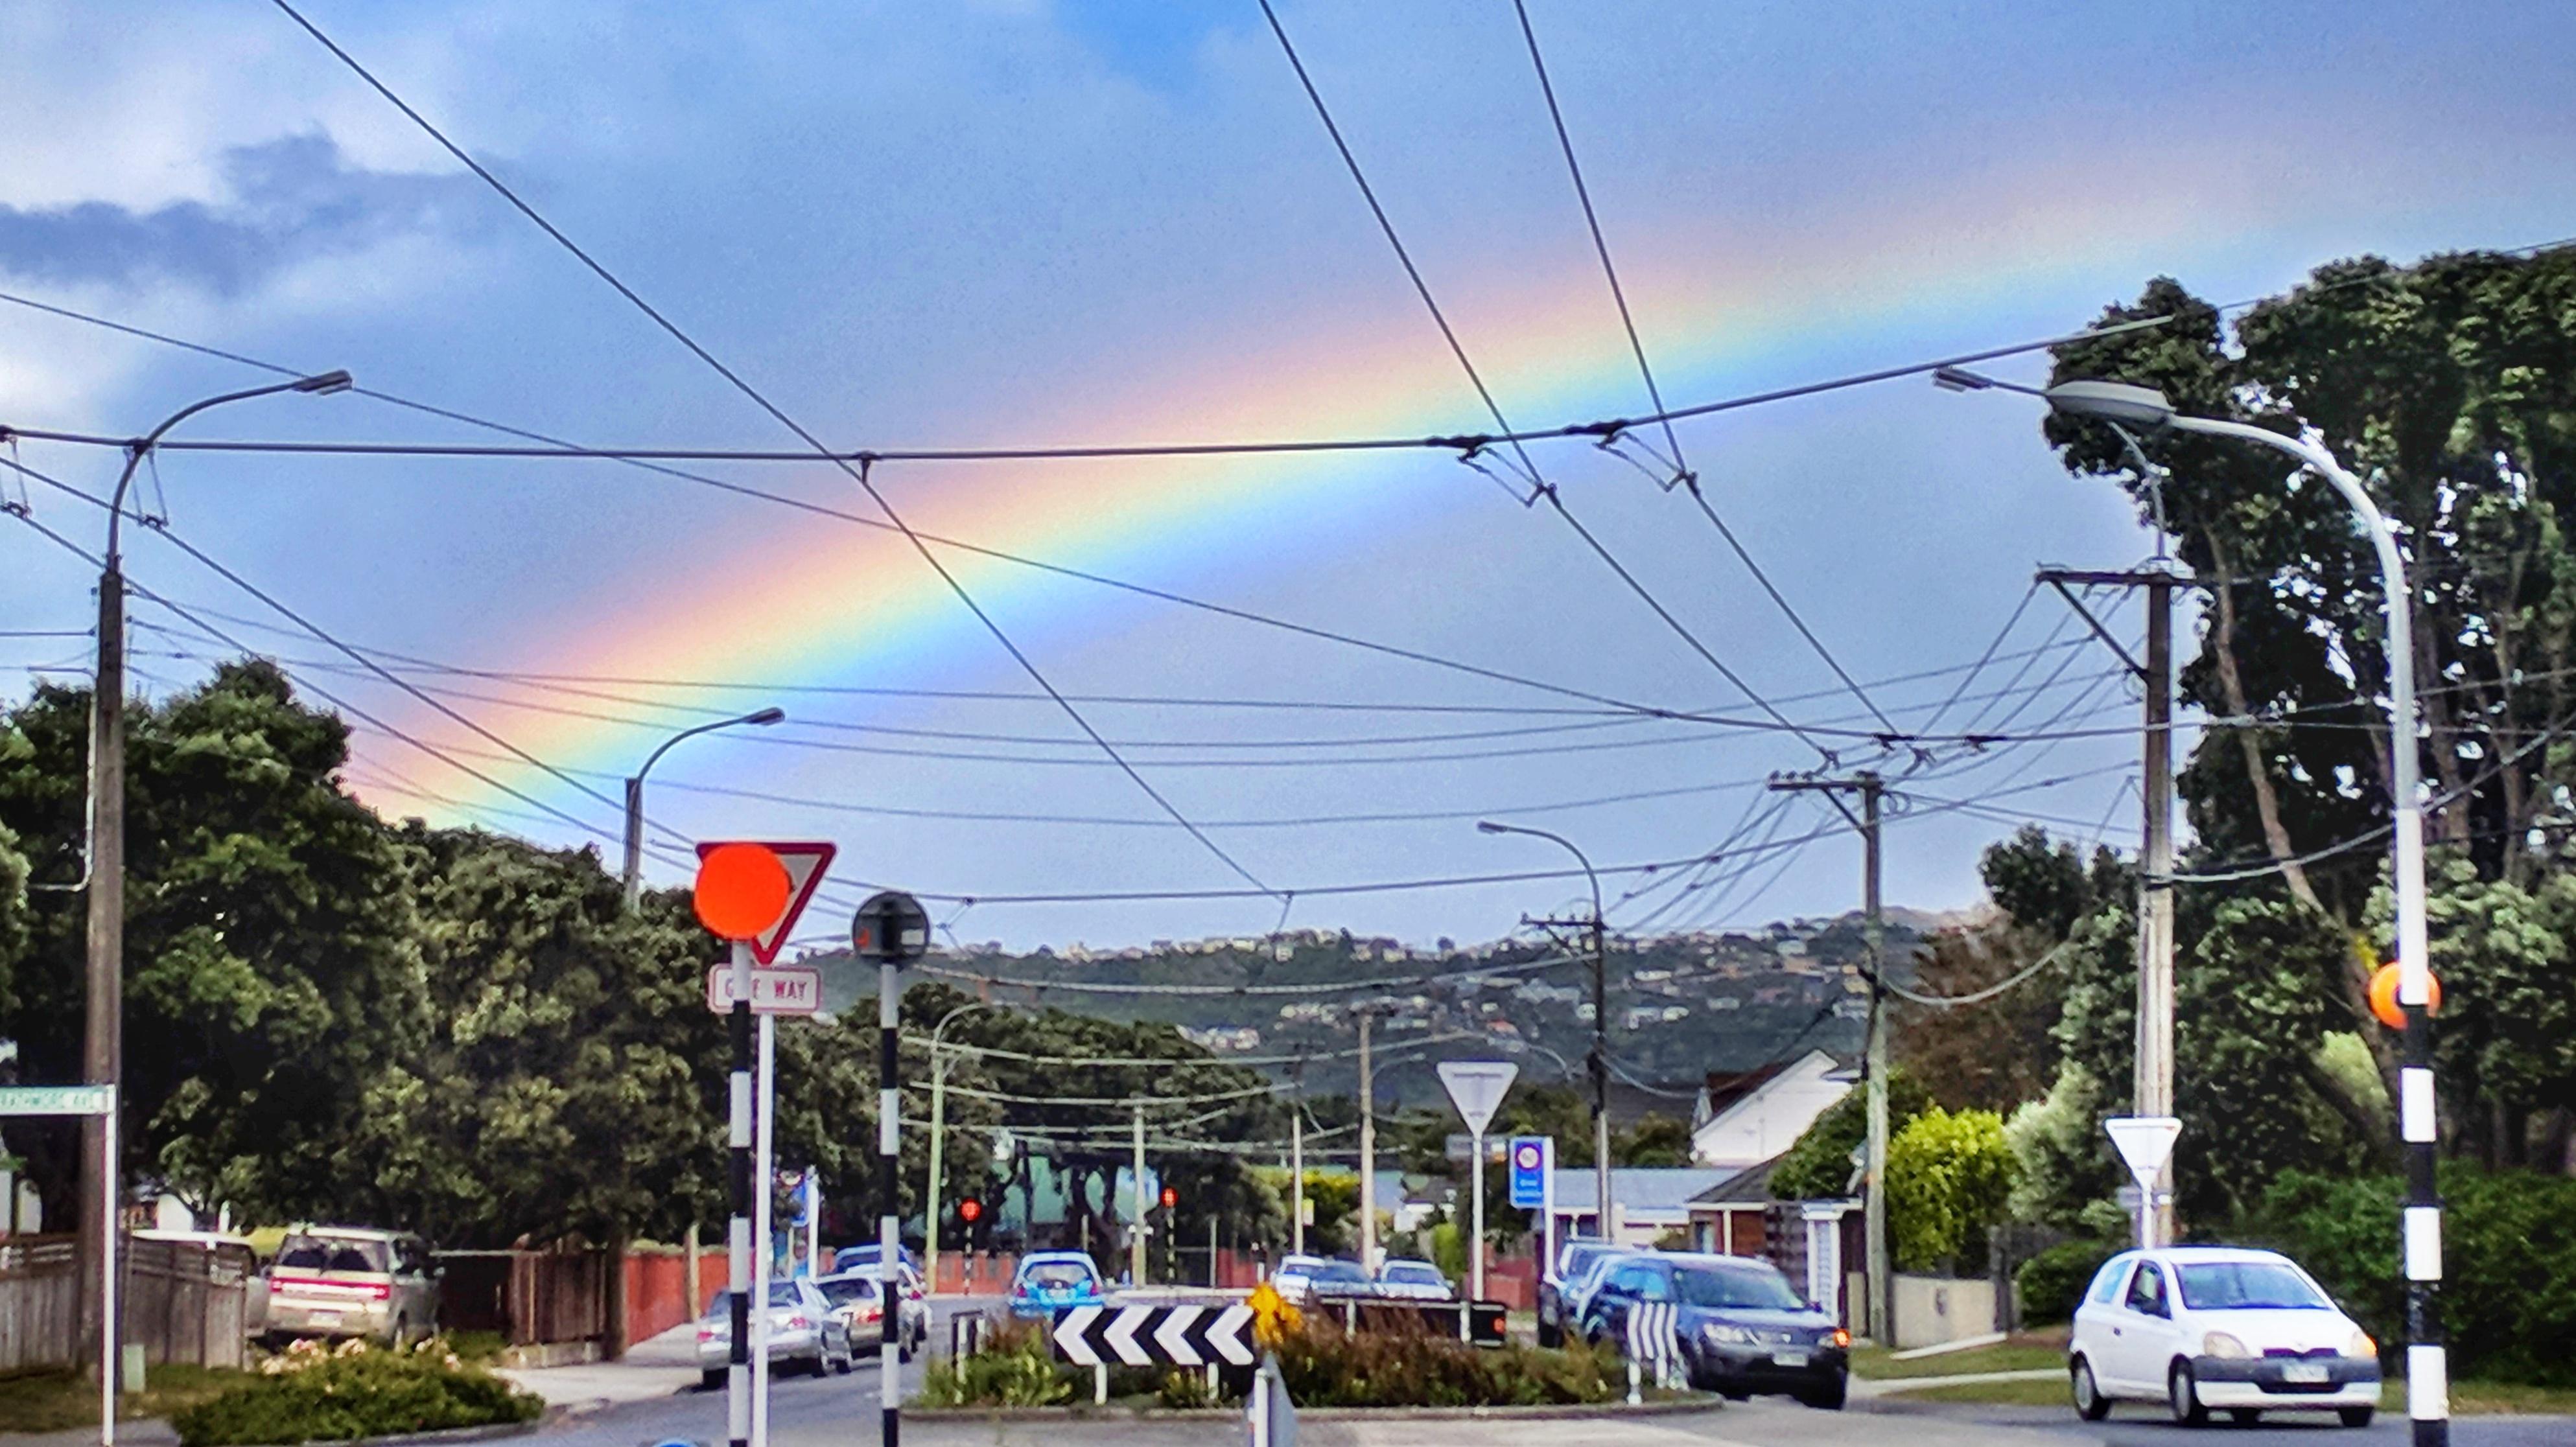 Daytime rainbow over Strathmore